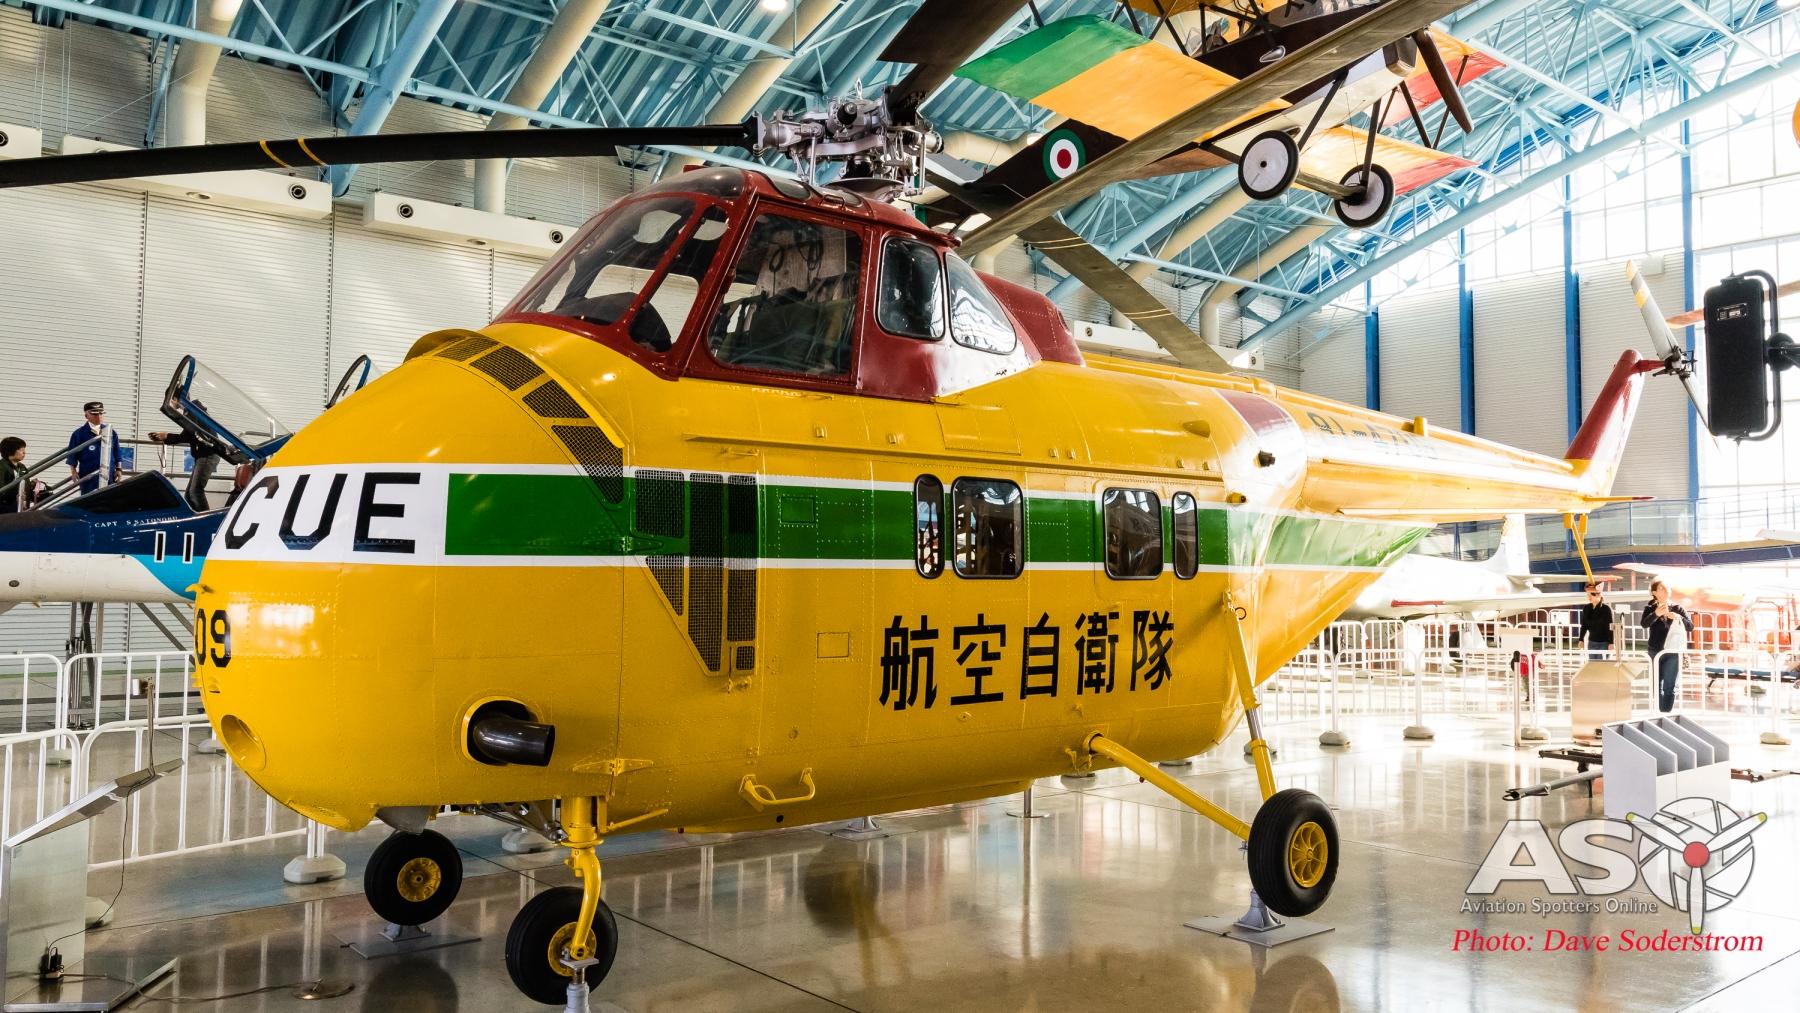 JASDF-Museum-2018-18-1-of-1